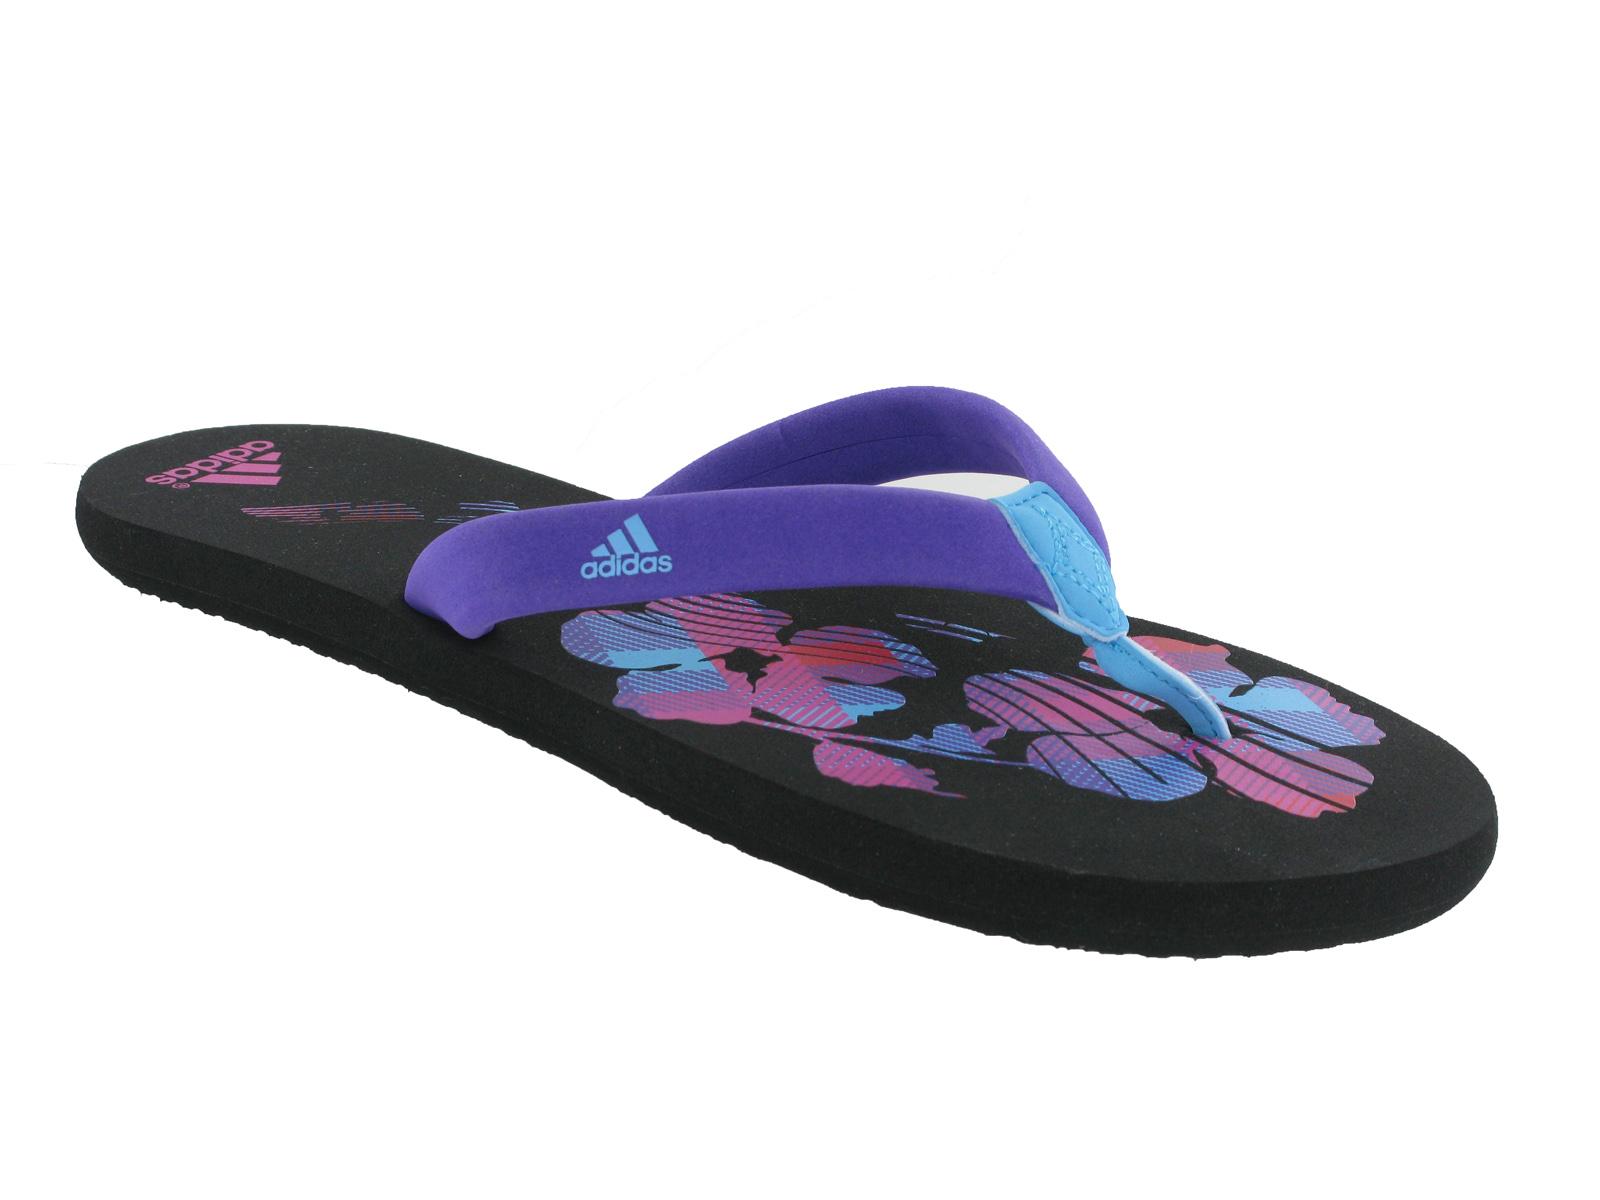 new womens adidas chilwa 2 light comfort flip flop beach. Black Bedroom Furniture Sets. Home Design Ideas